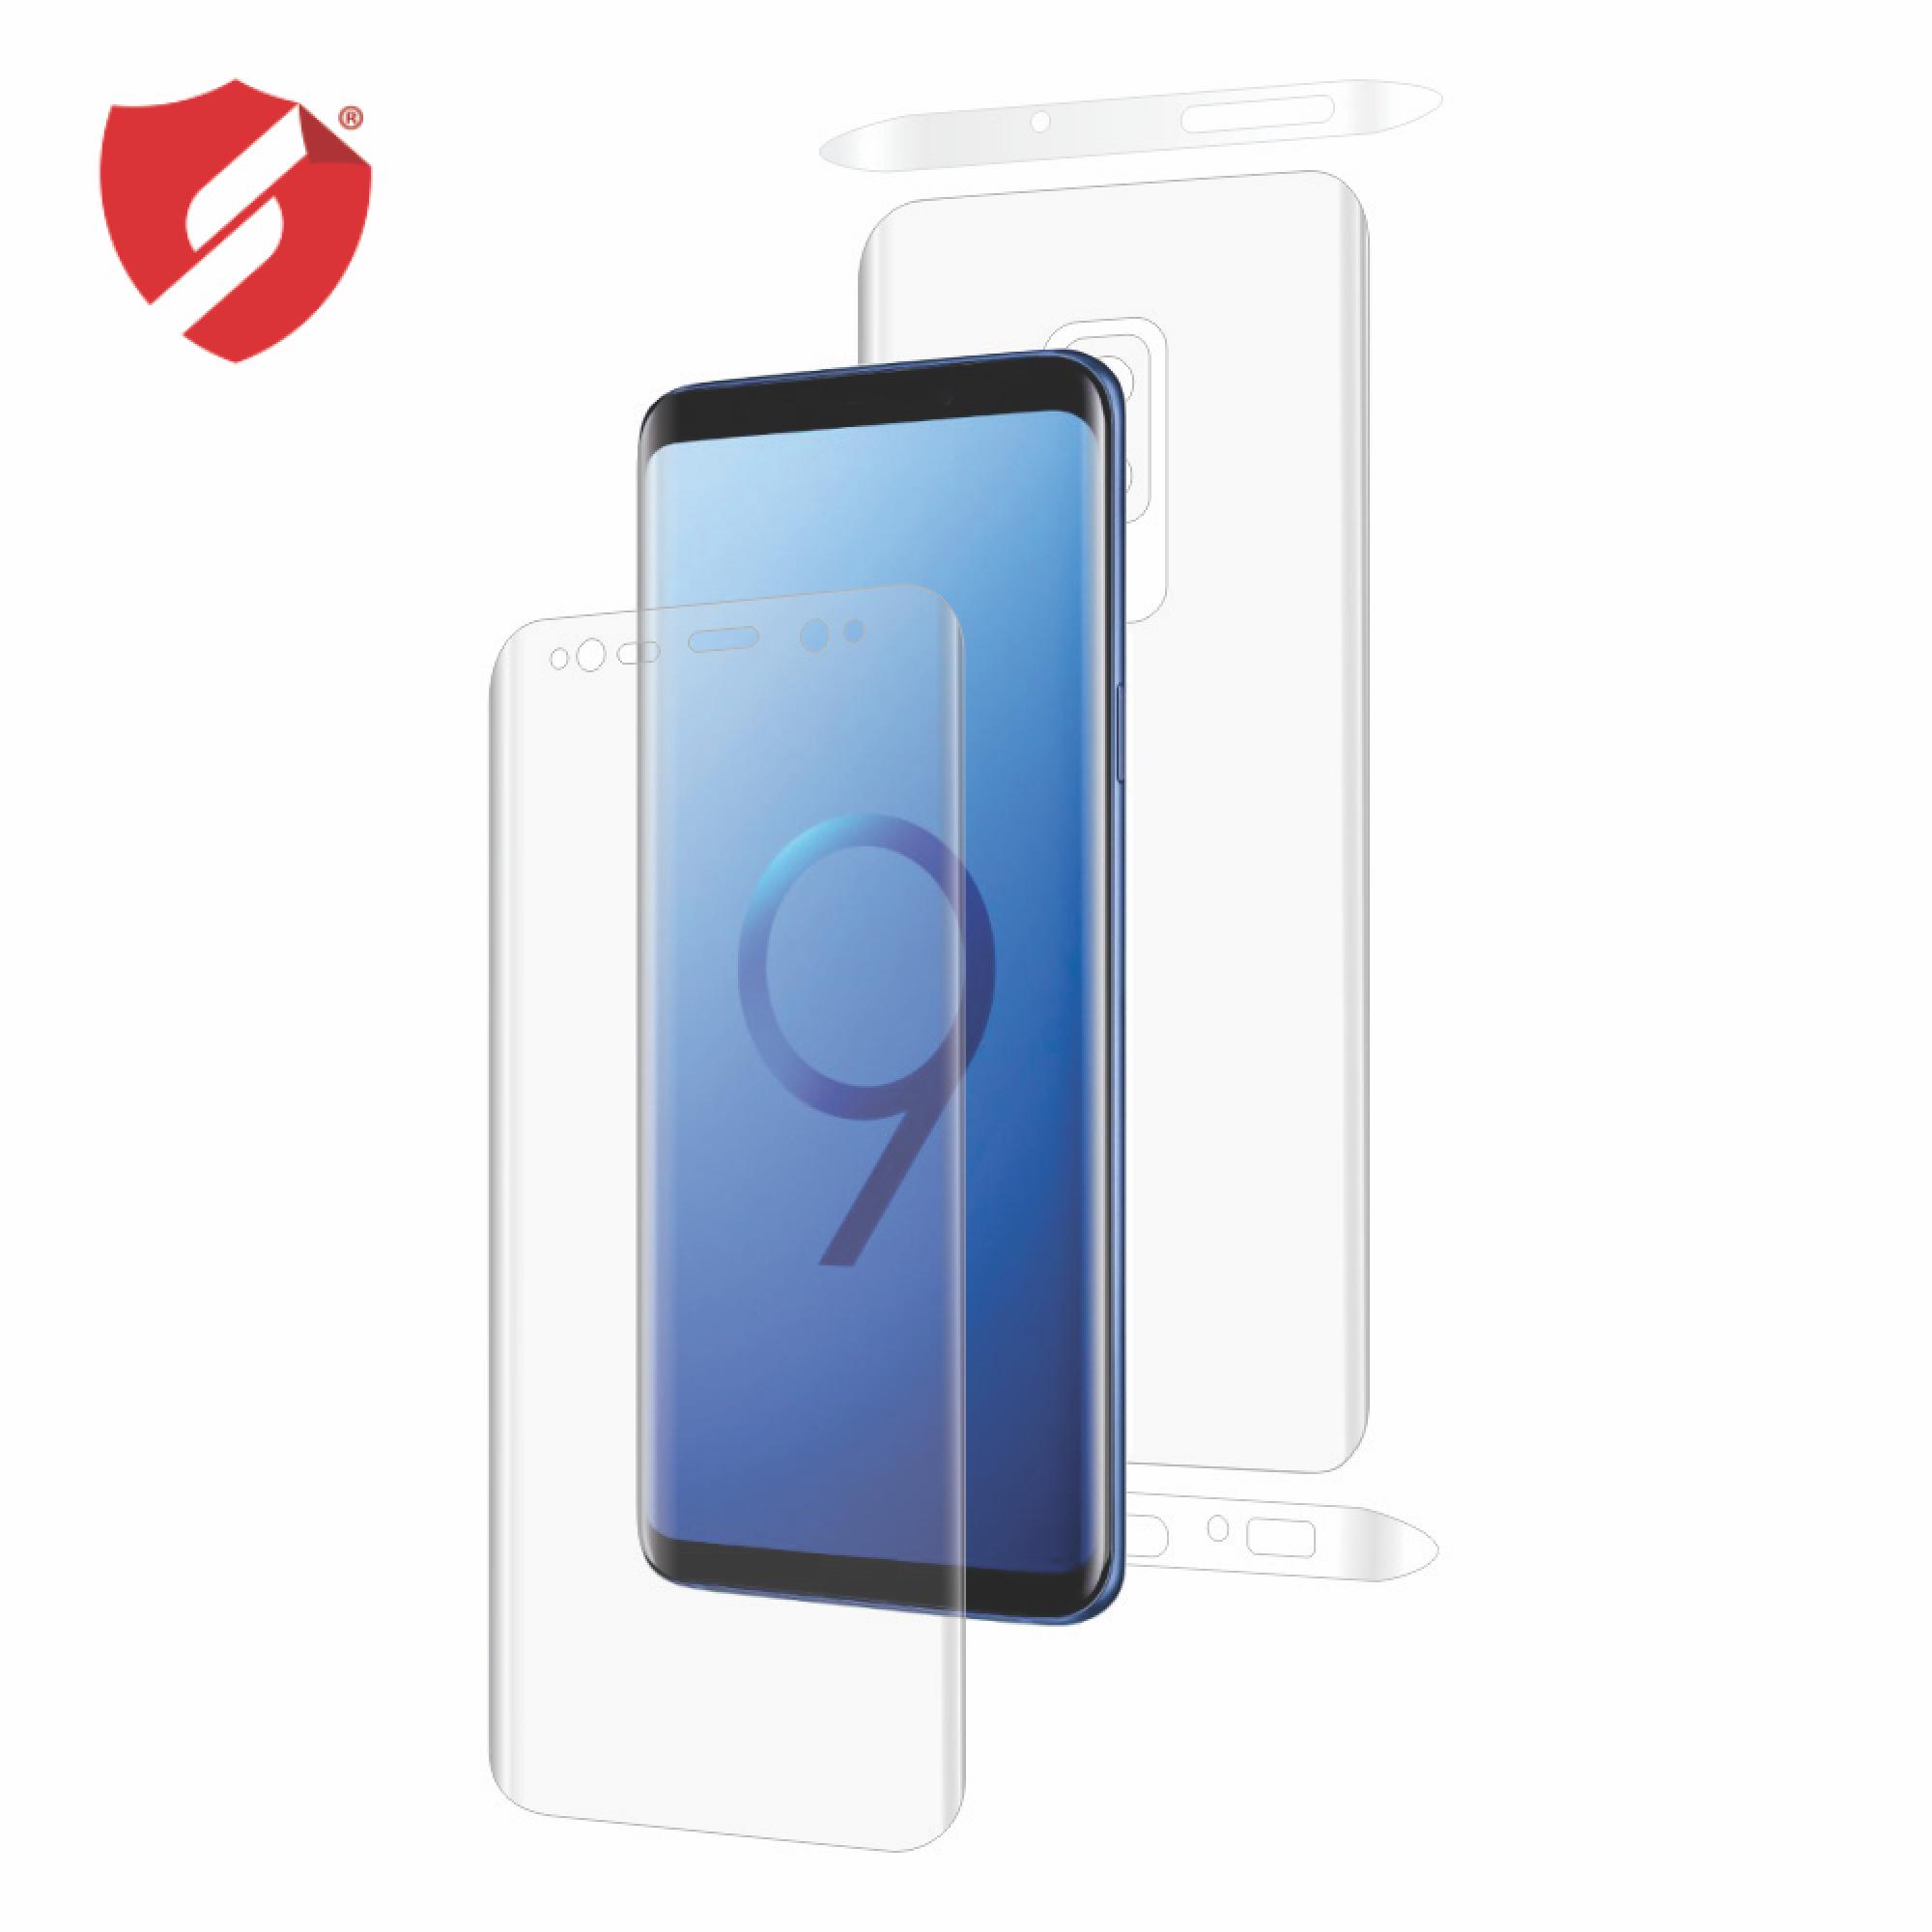 Folie de protectie Smart Protection Samsung Galaxy S9 Plus compatibila cu carcasa Nillkin Frosted - fullbody - display + spate + laterale imagine